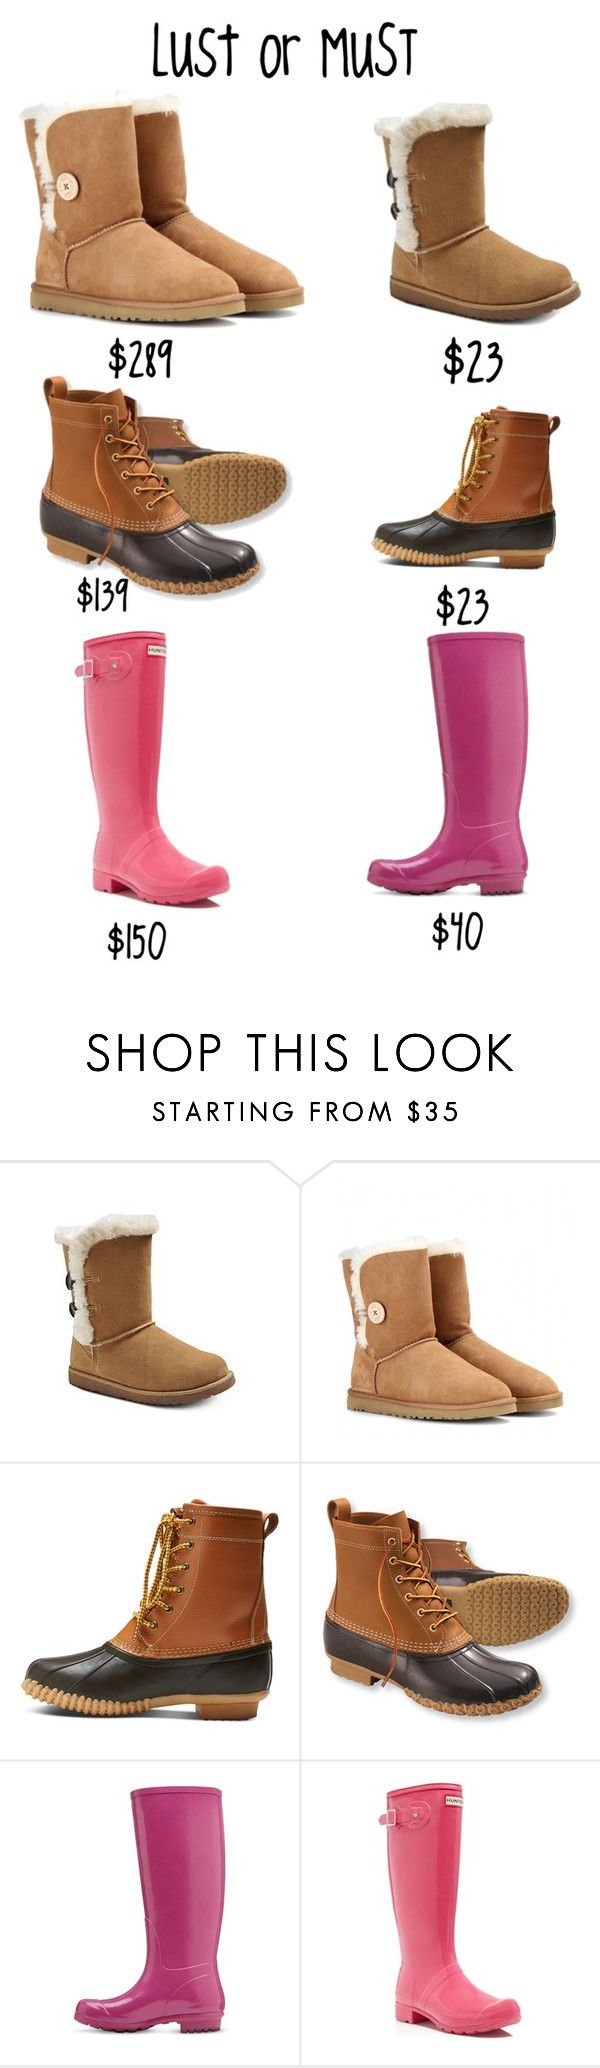 ugg boots target